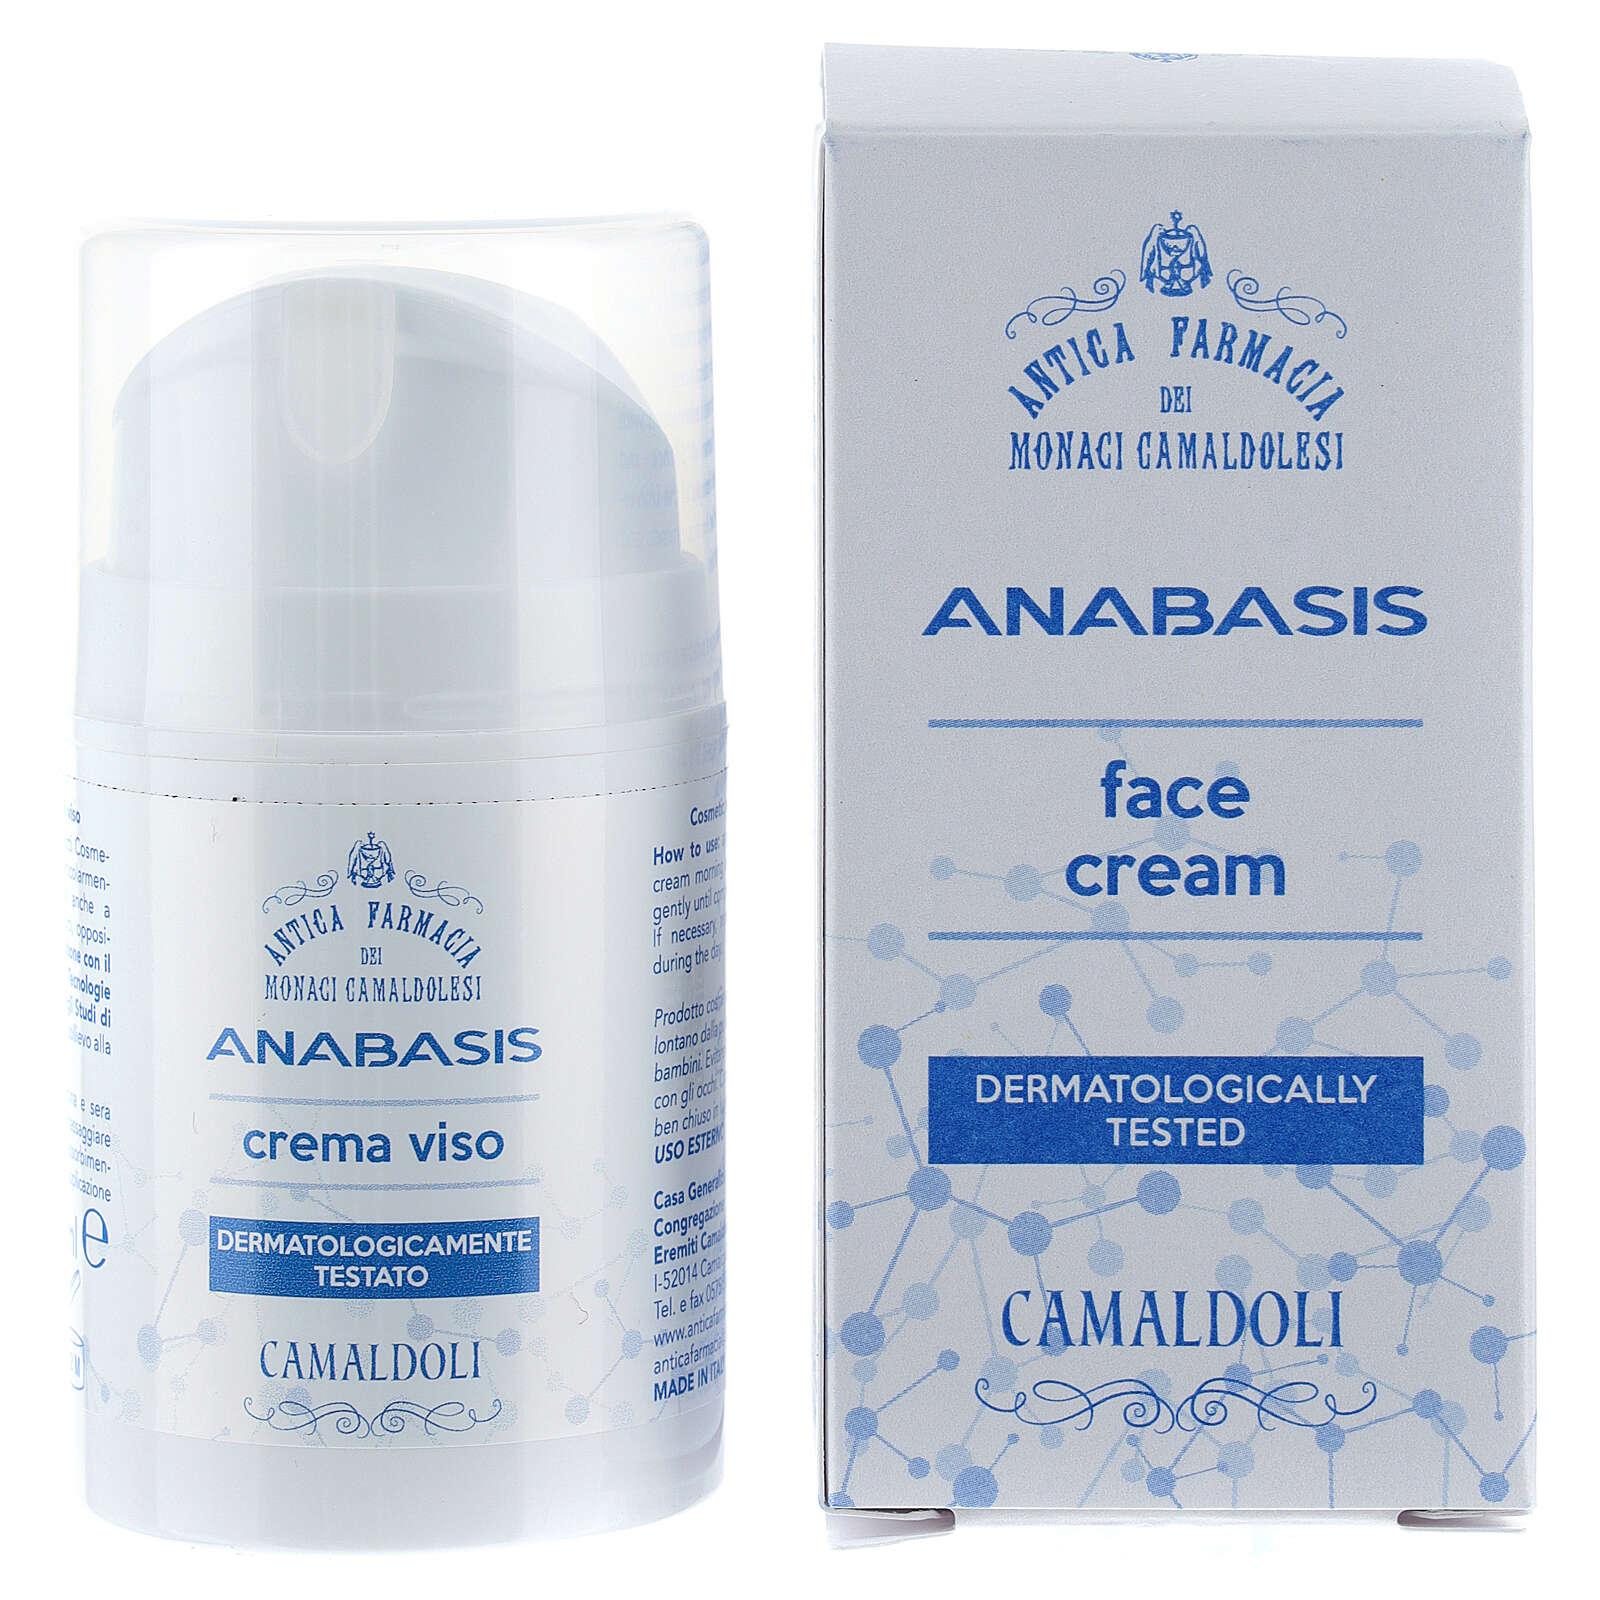 Crema viso 50 ml Camaldoli linea Anabasis 4